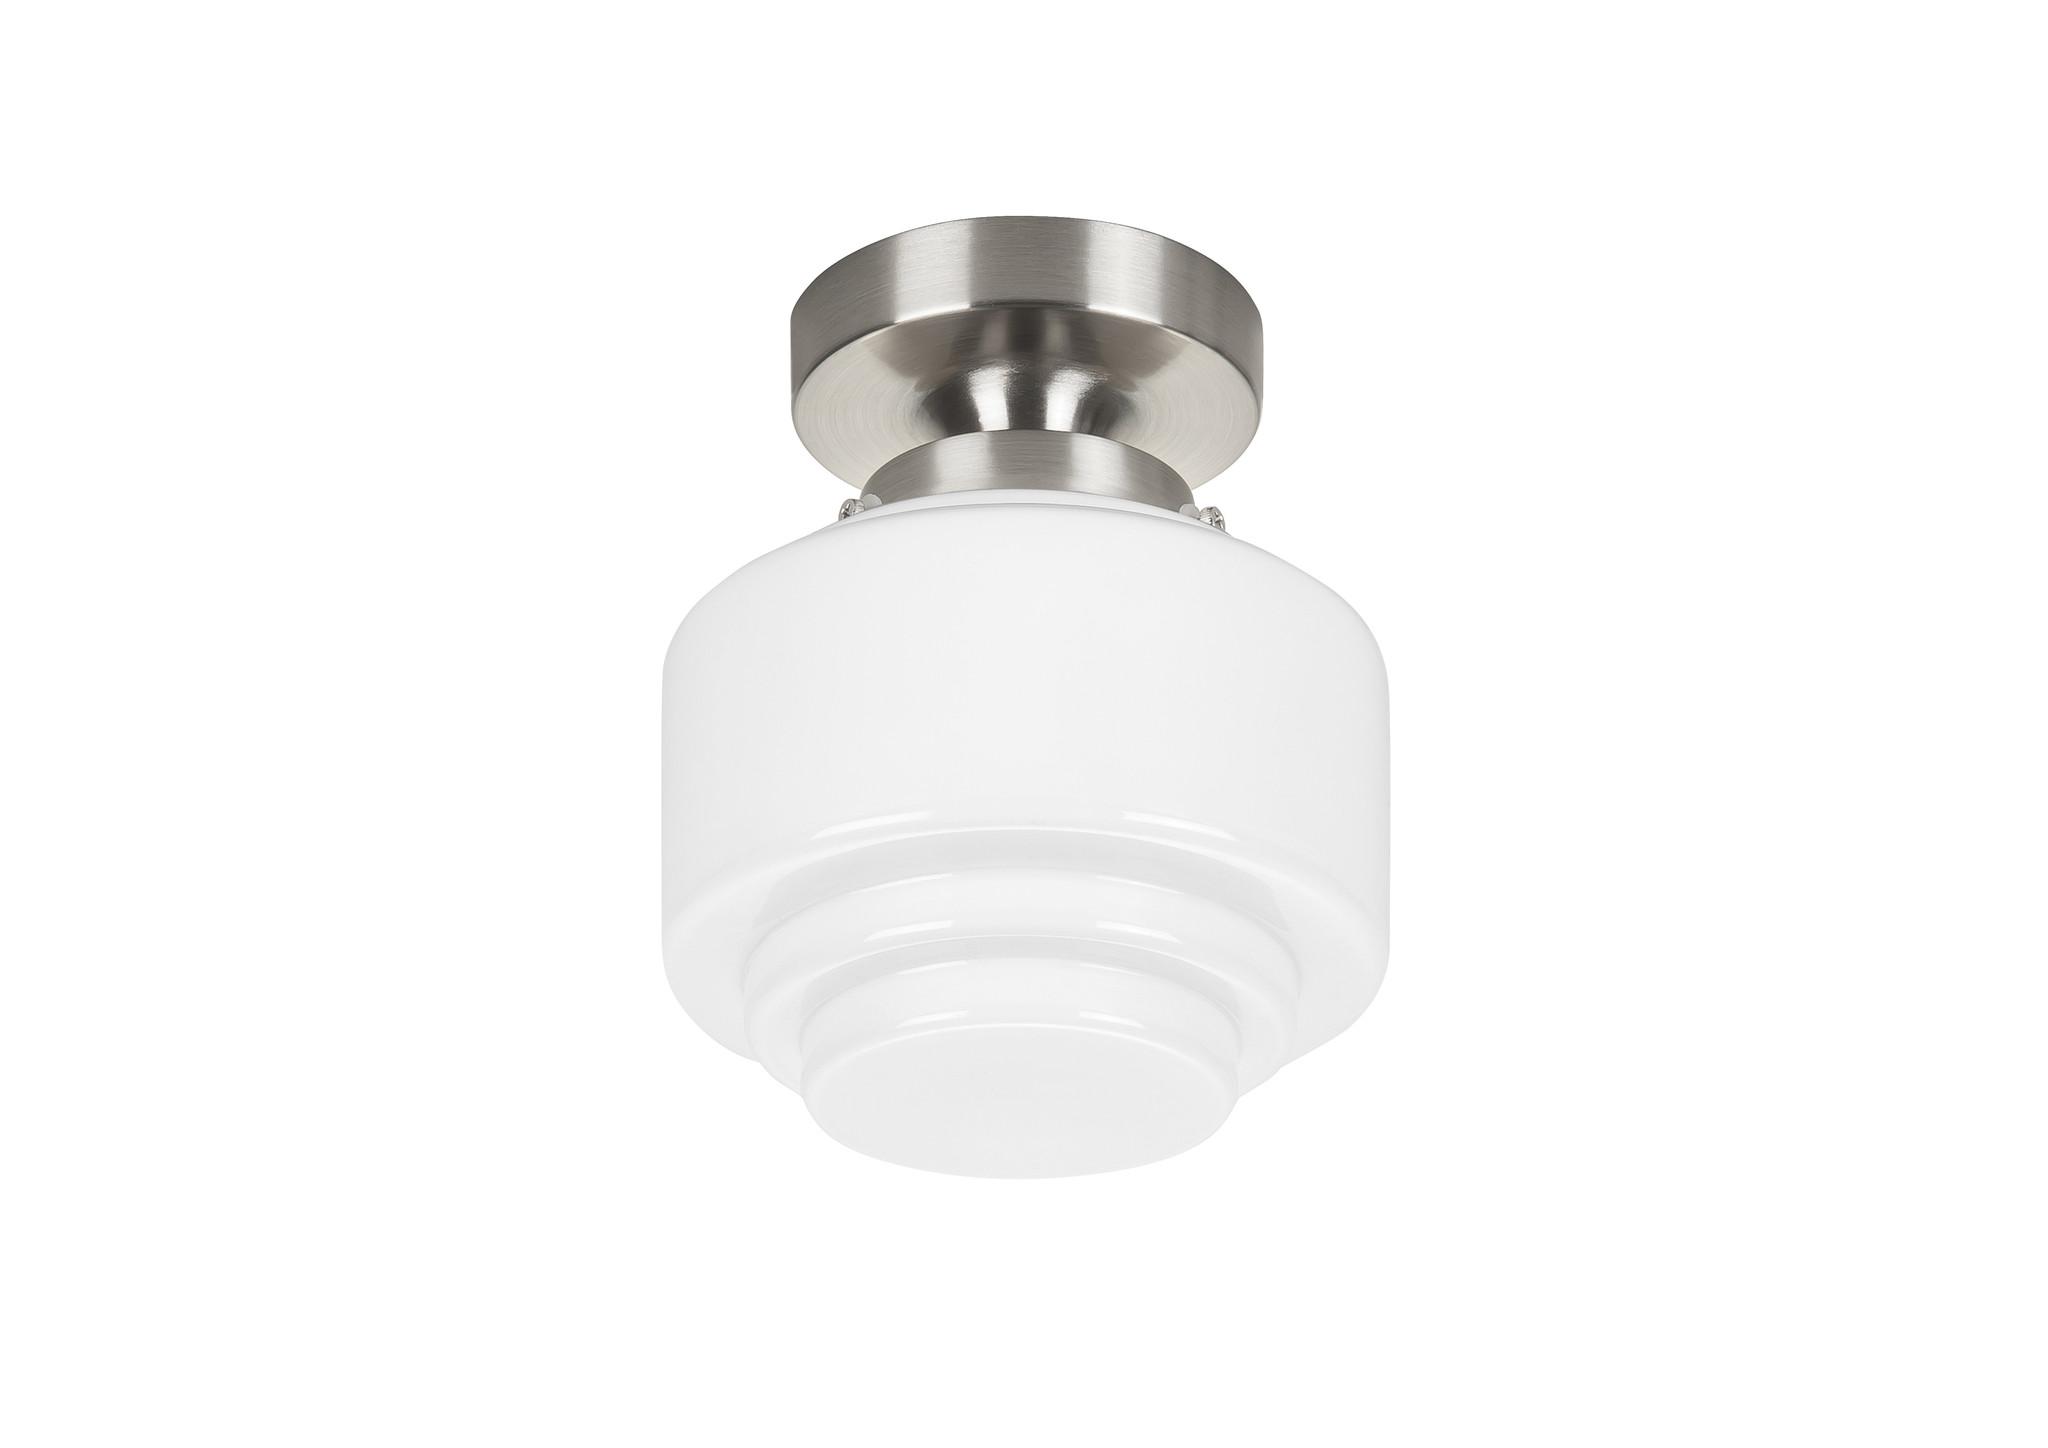 Plafondlamp Cambridge Wit Opaal Glans 15cm      8718379029622